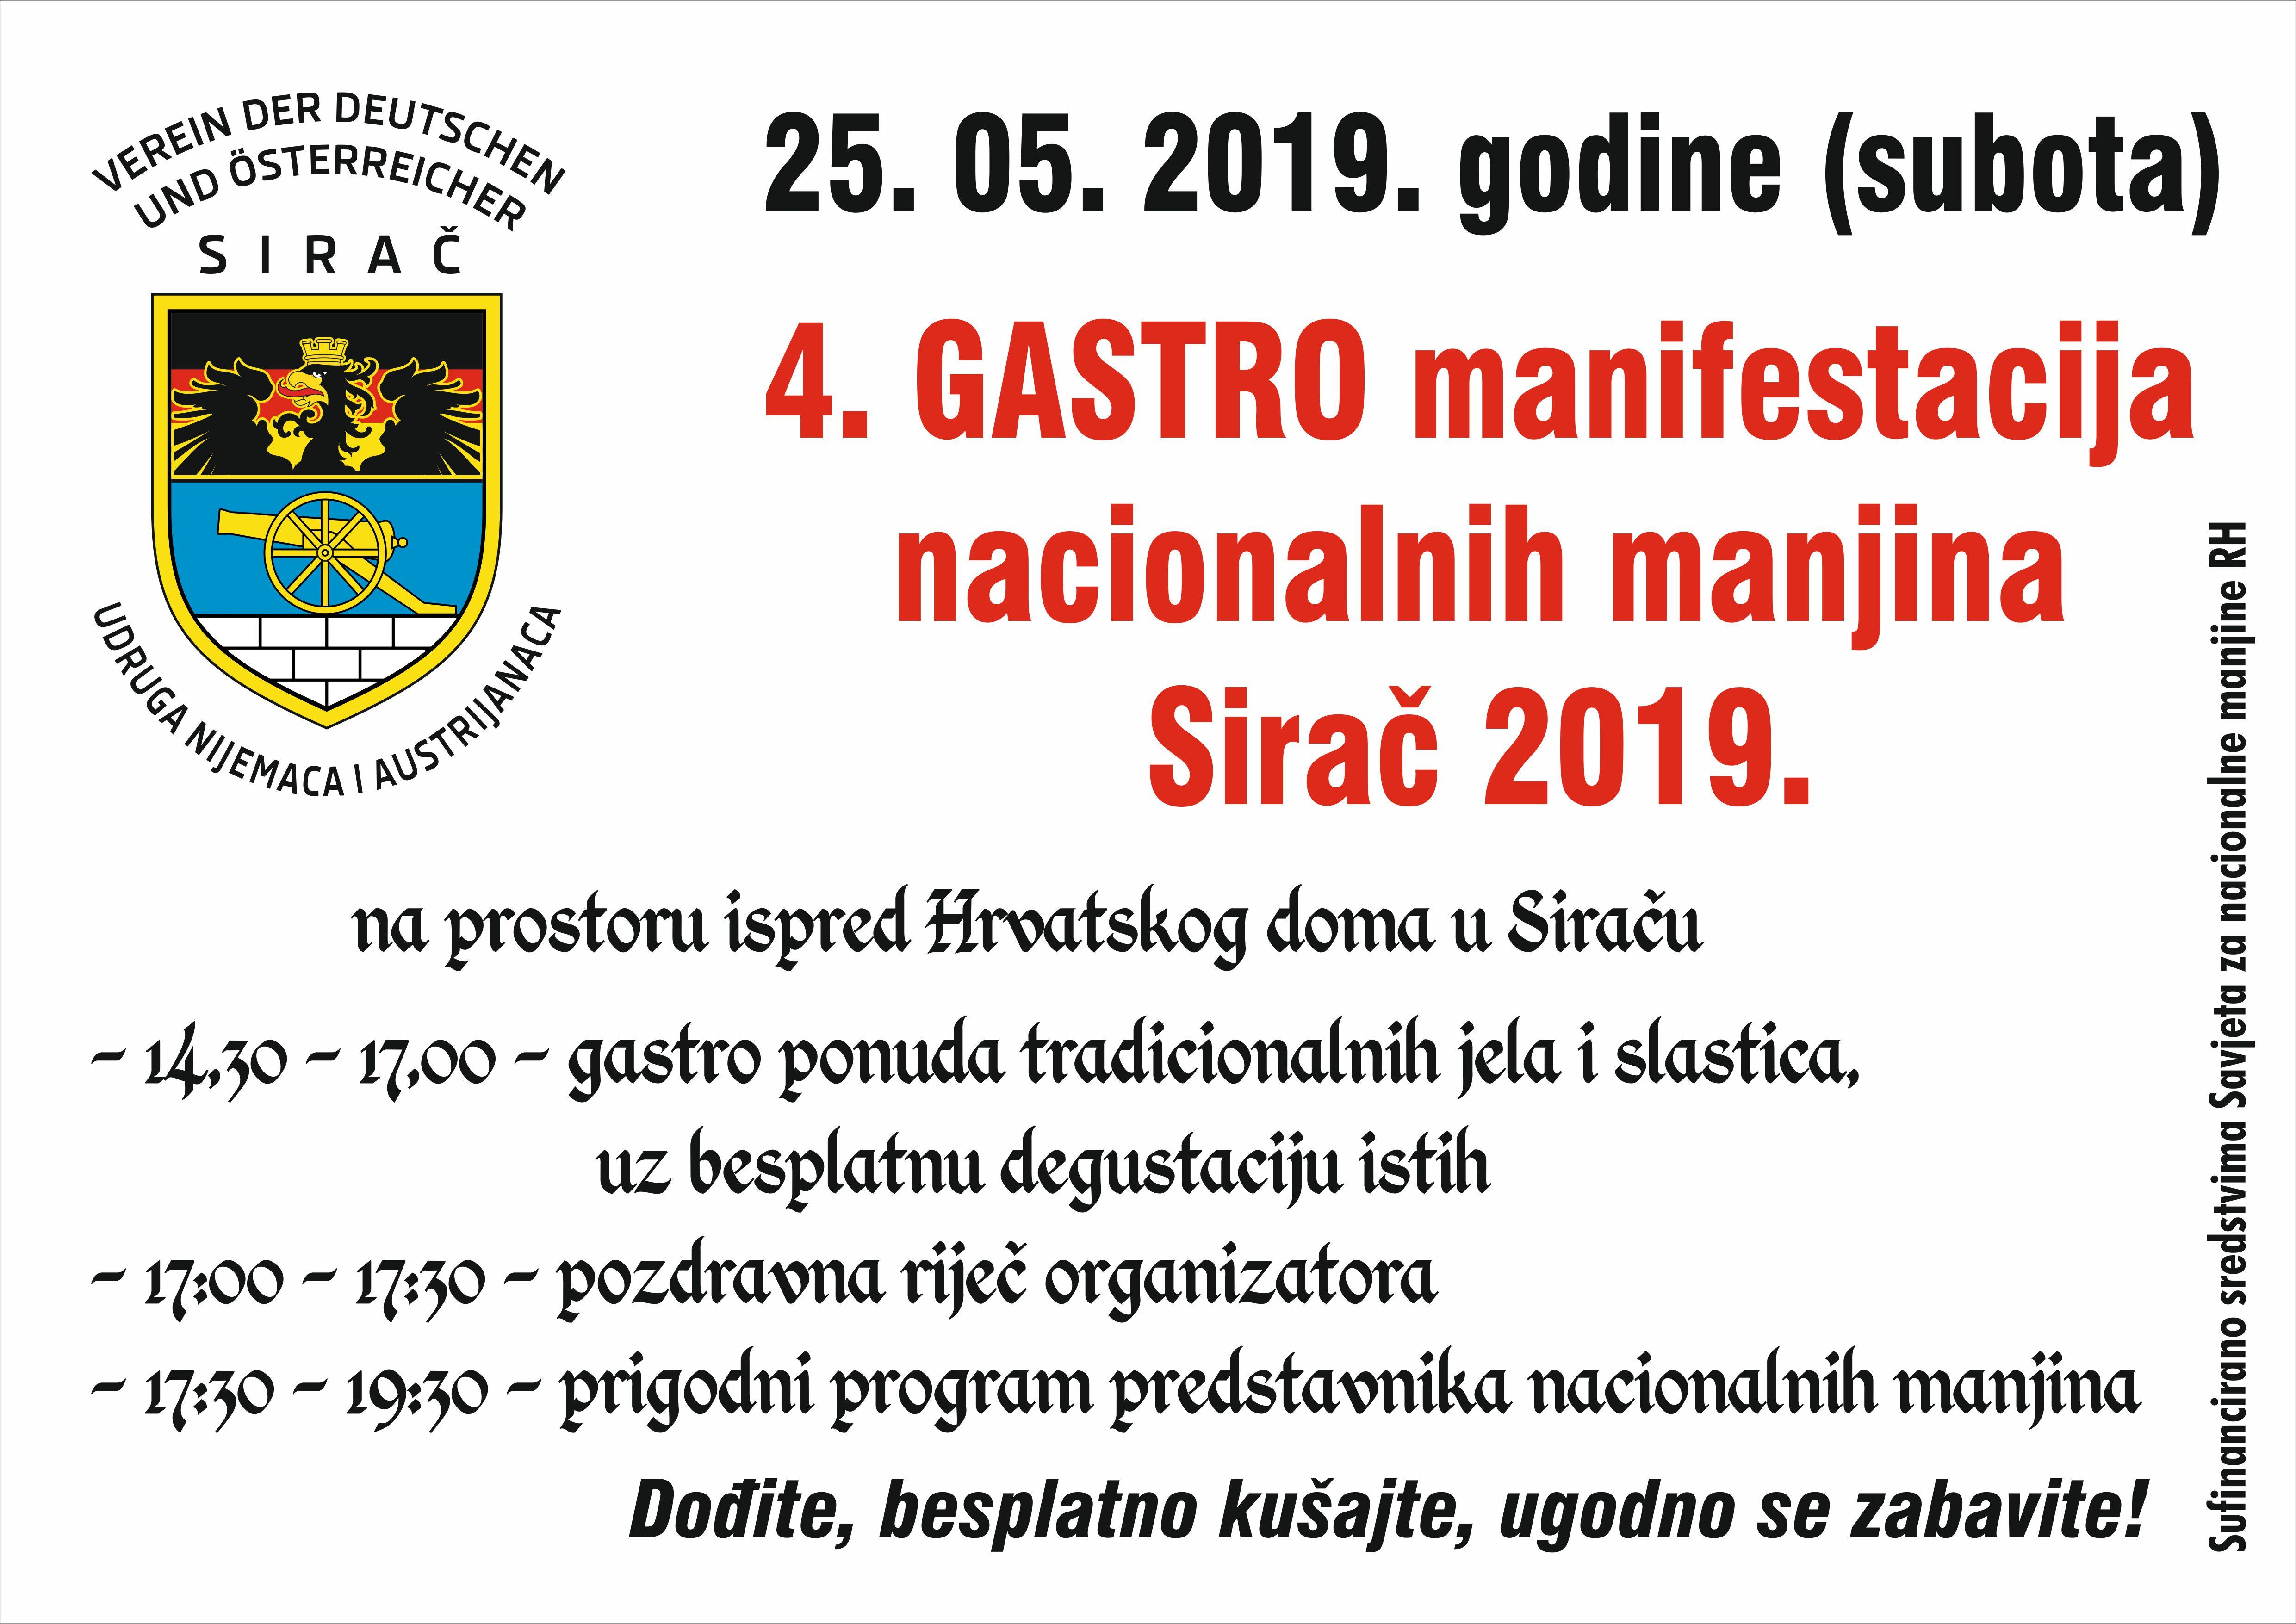 Udruga-Njemaca-plakati-2019